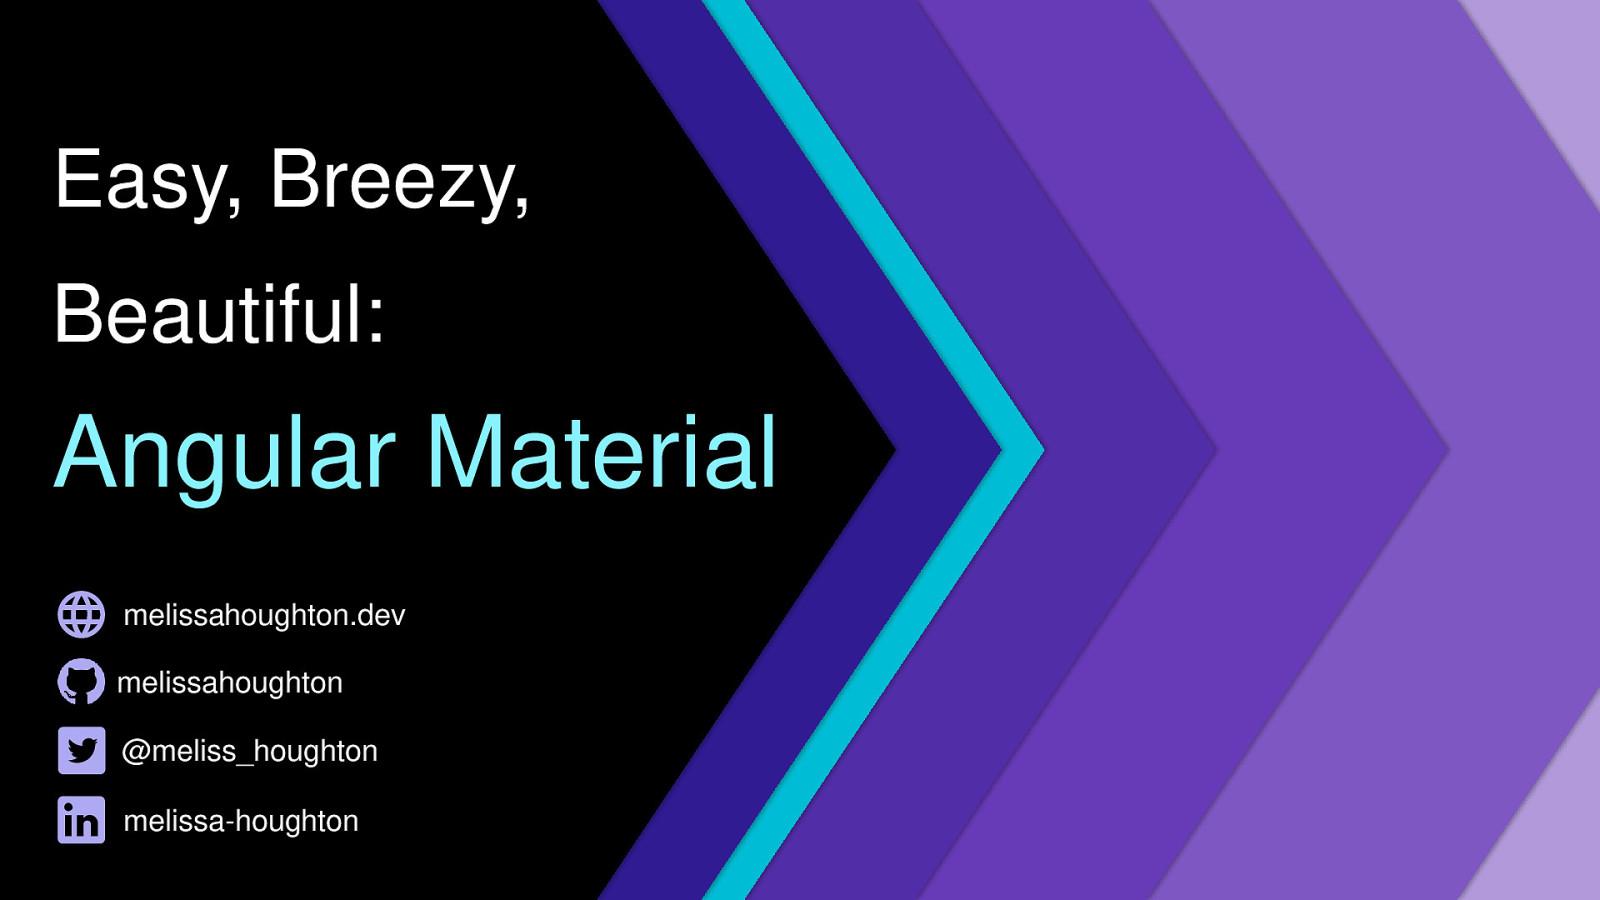 Easy, Breezy, Beautiful: Angular Material